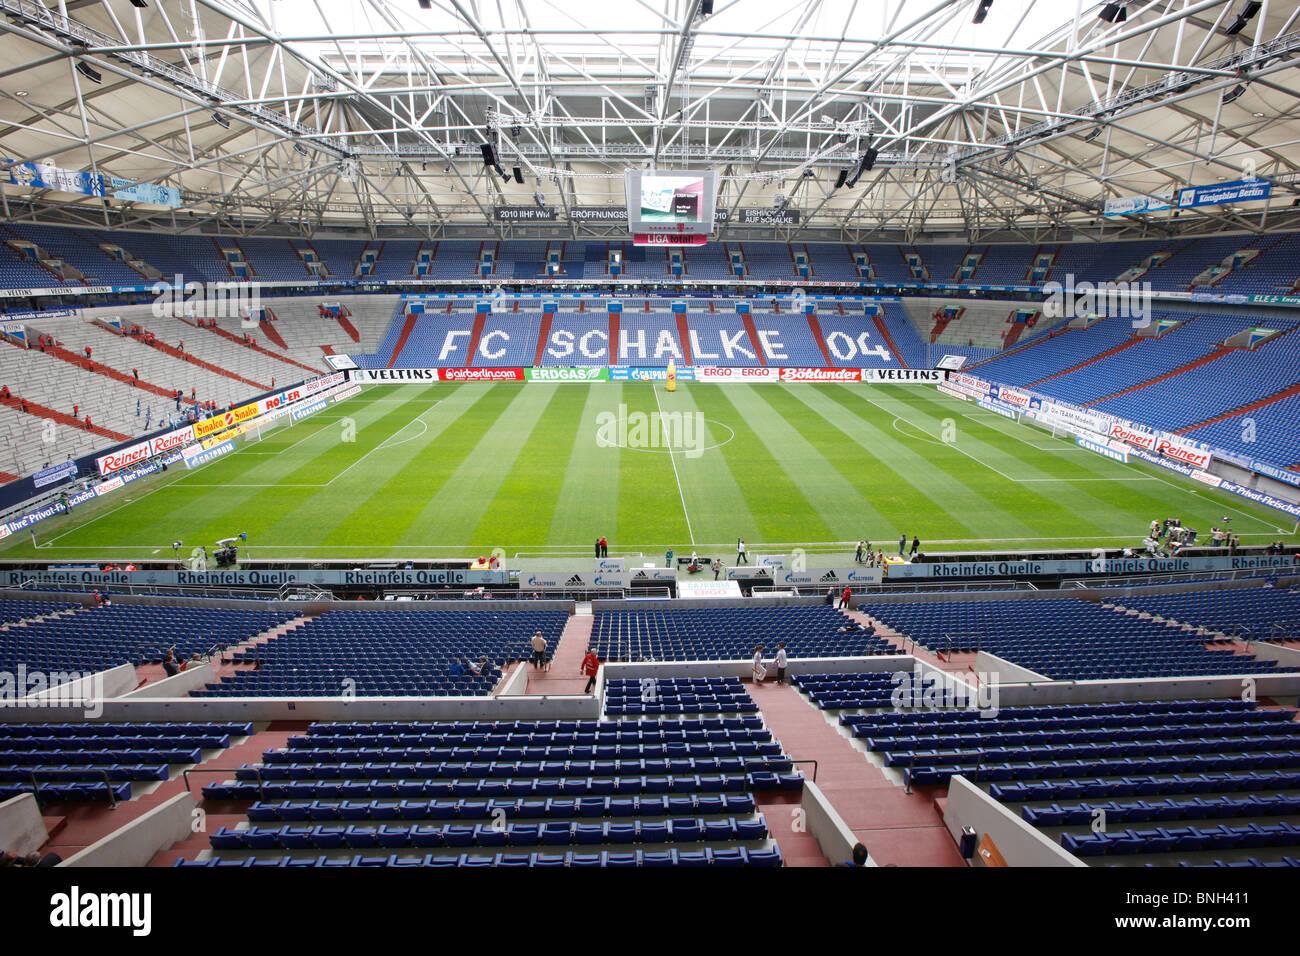 Veltins Areana, big sports stadium, home of German Bundesliga, first division club Schalke 04, Gelsenkrichen, Germany. - Stock Image